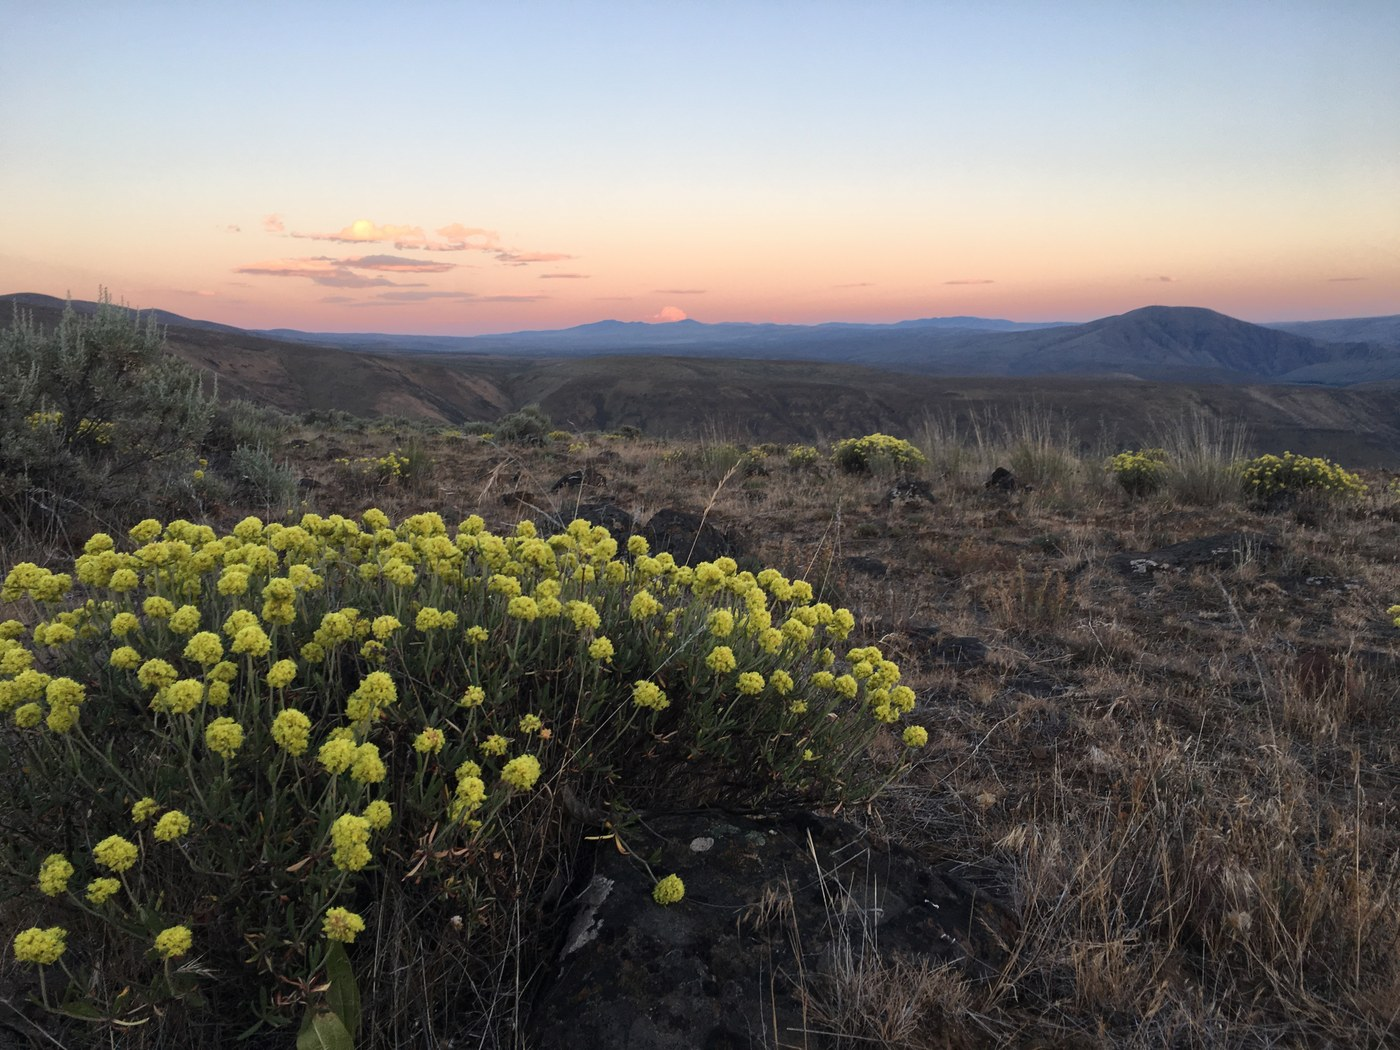 Rattlesnake Dance Ridge at sunset